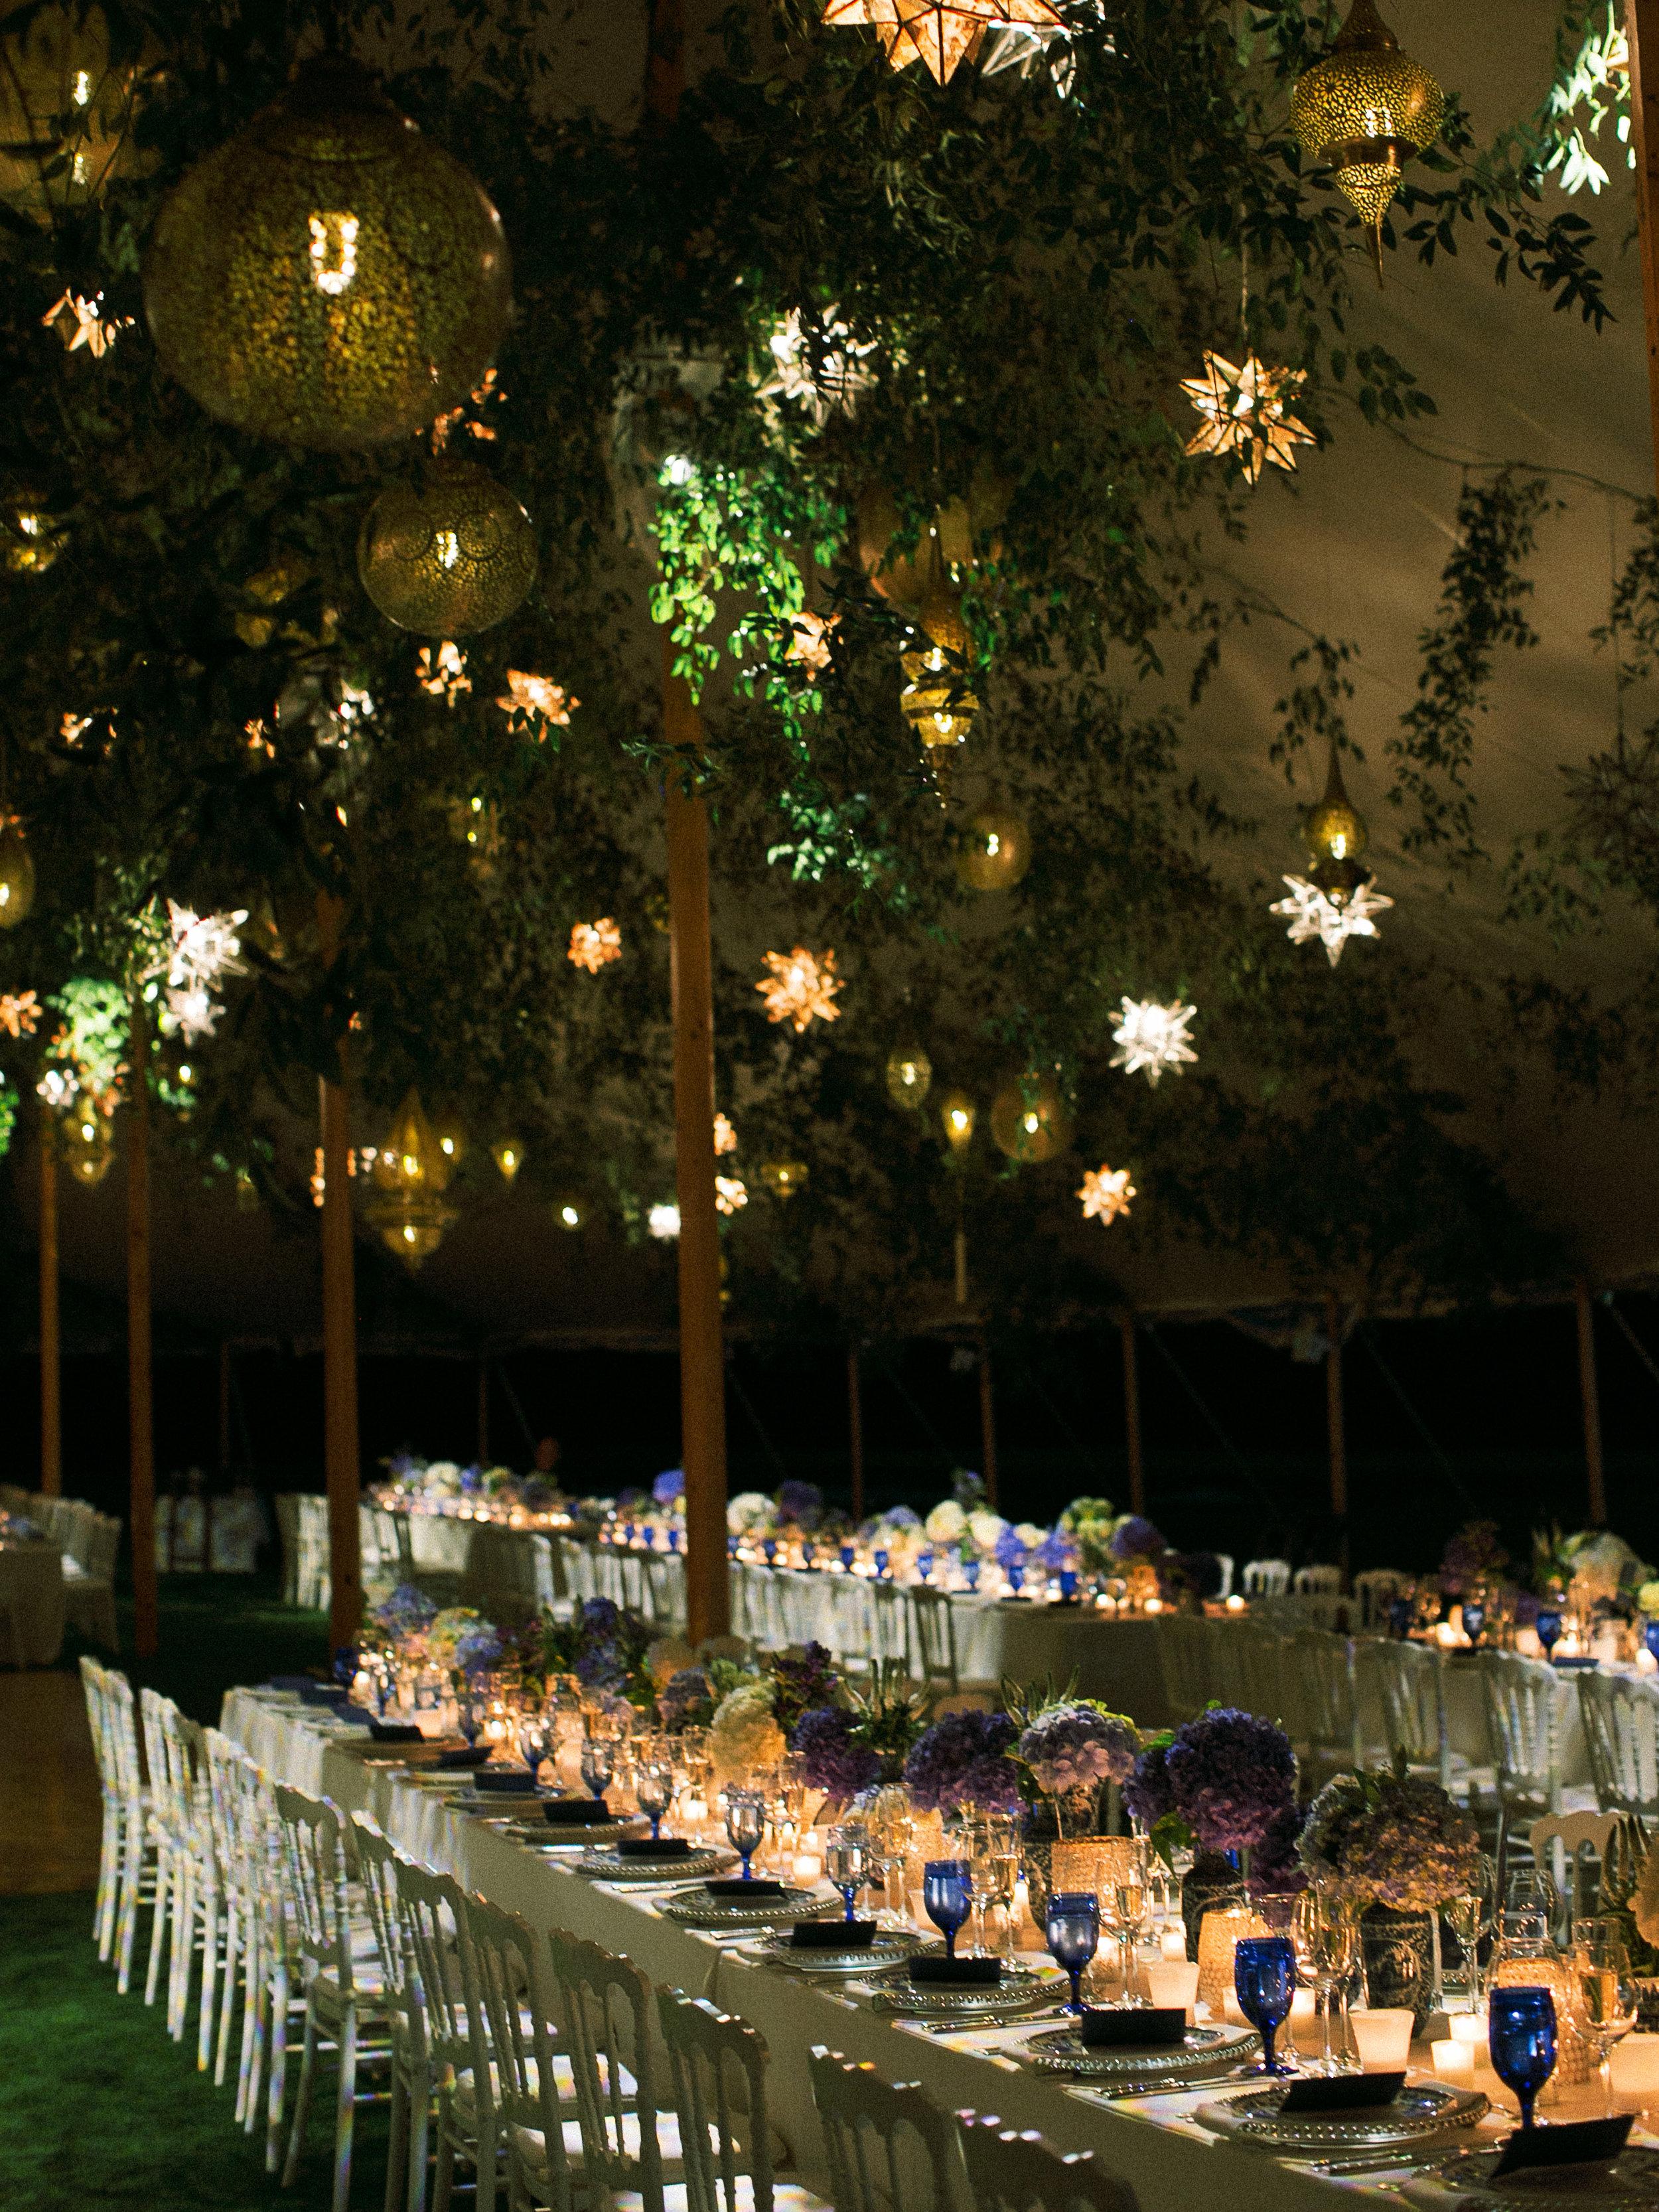 Wedding First Dance, Sperry Sail Cloth Tent Wedding, Old Fashioned Wedding, Moroccan Lantern Wedding,  Ceiling Installation, Nicole Simeral Wedding Planner